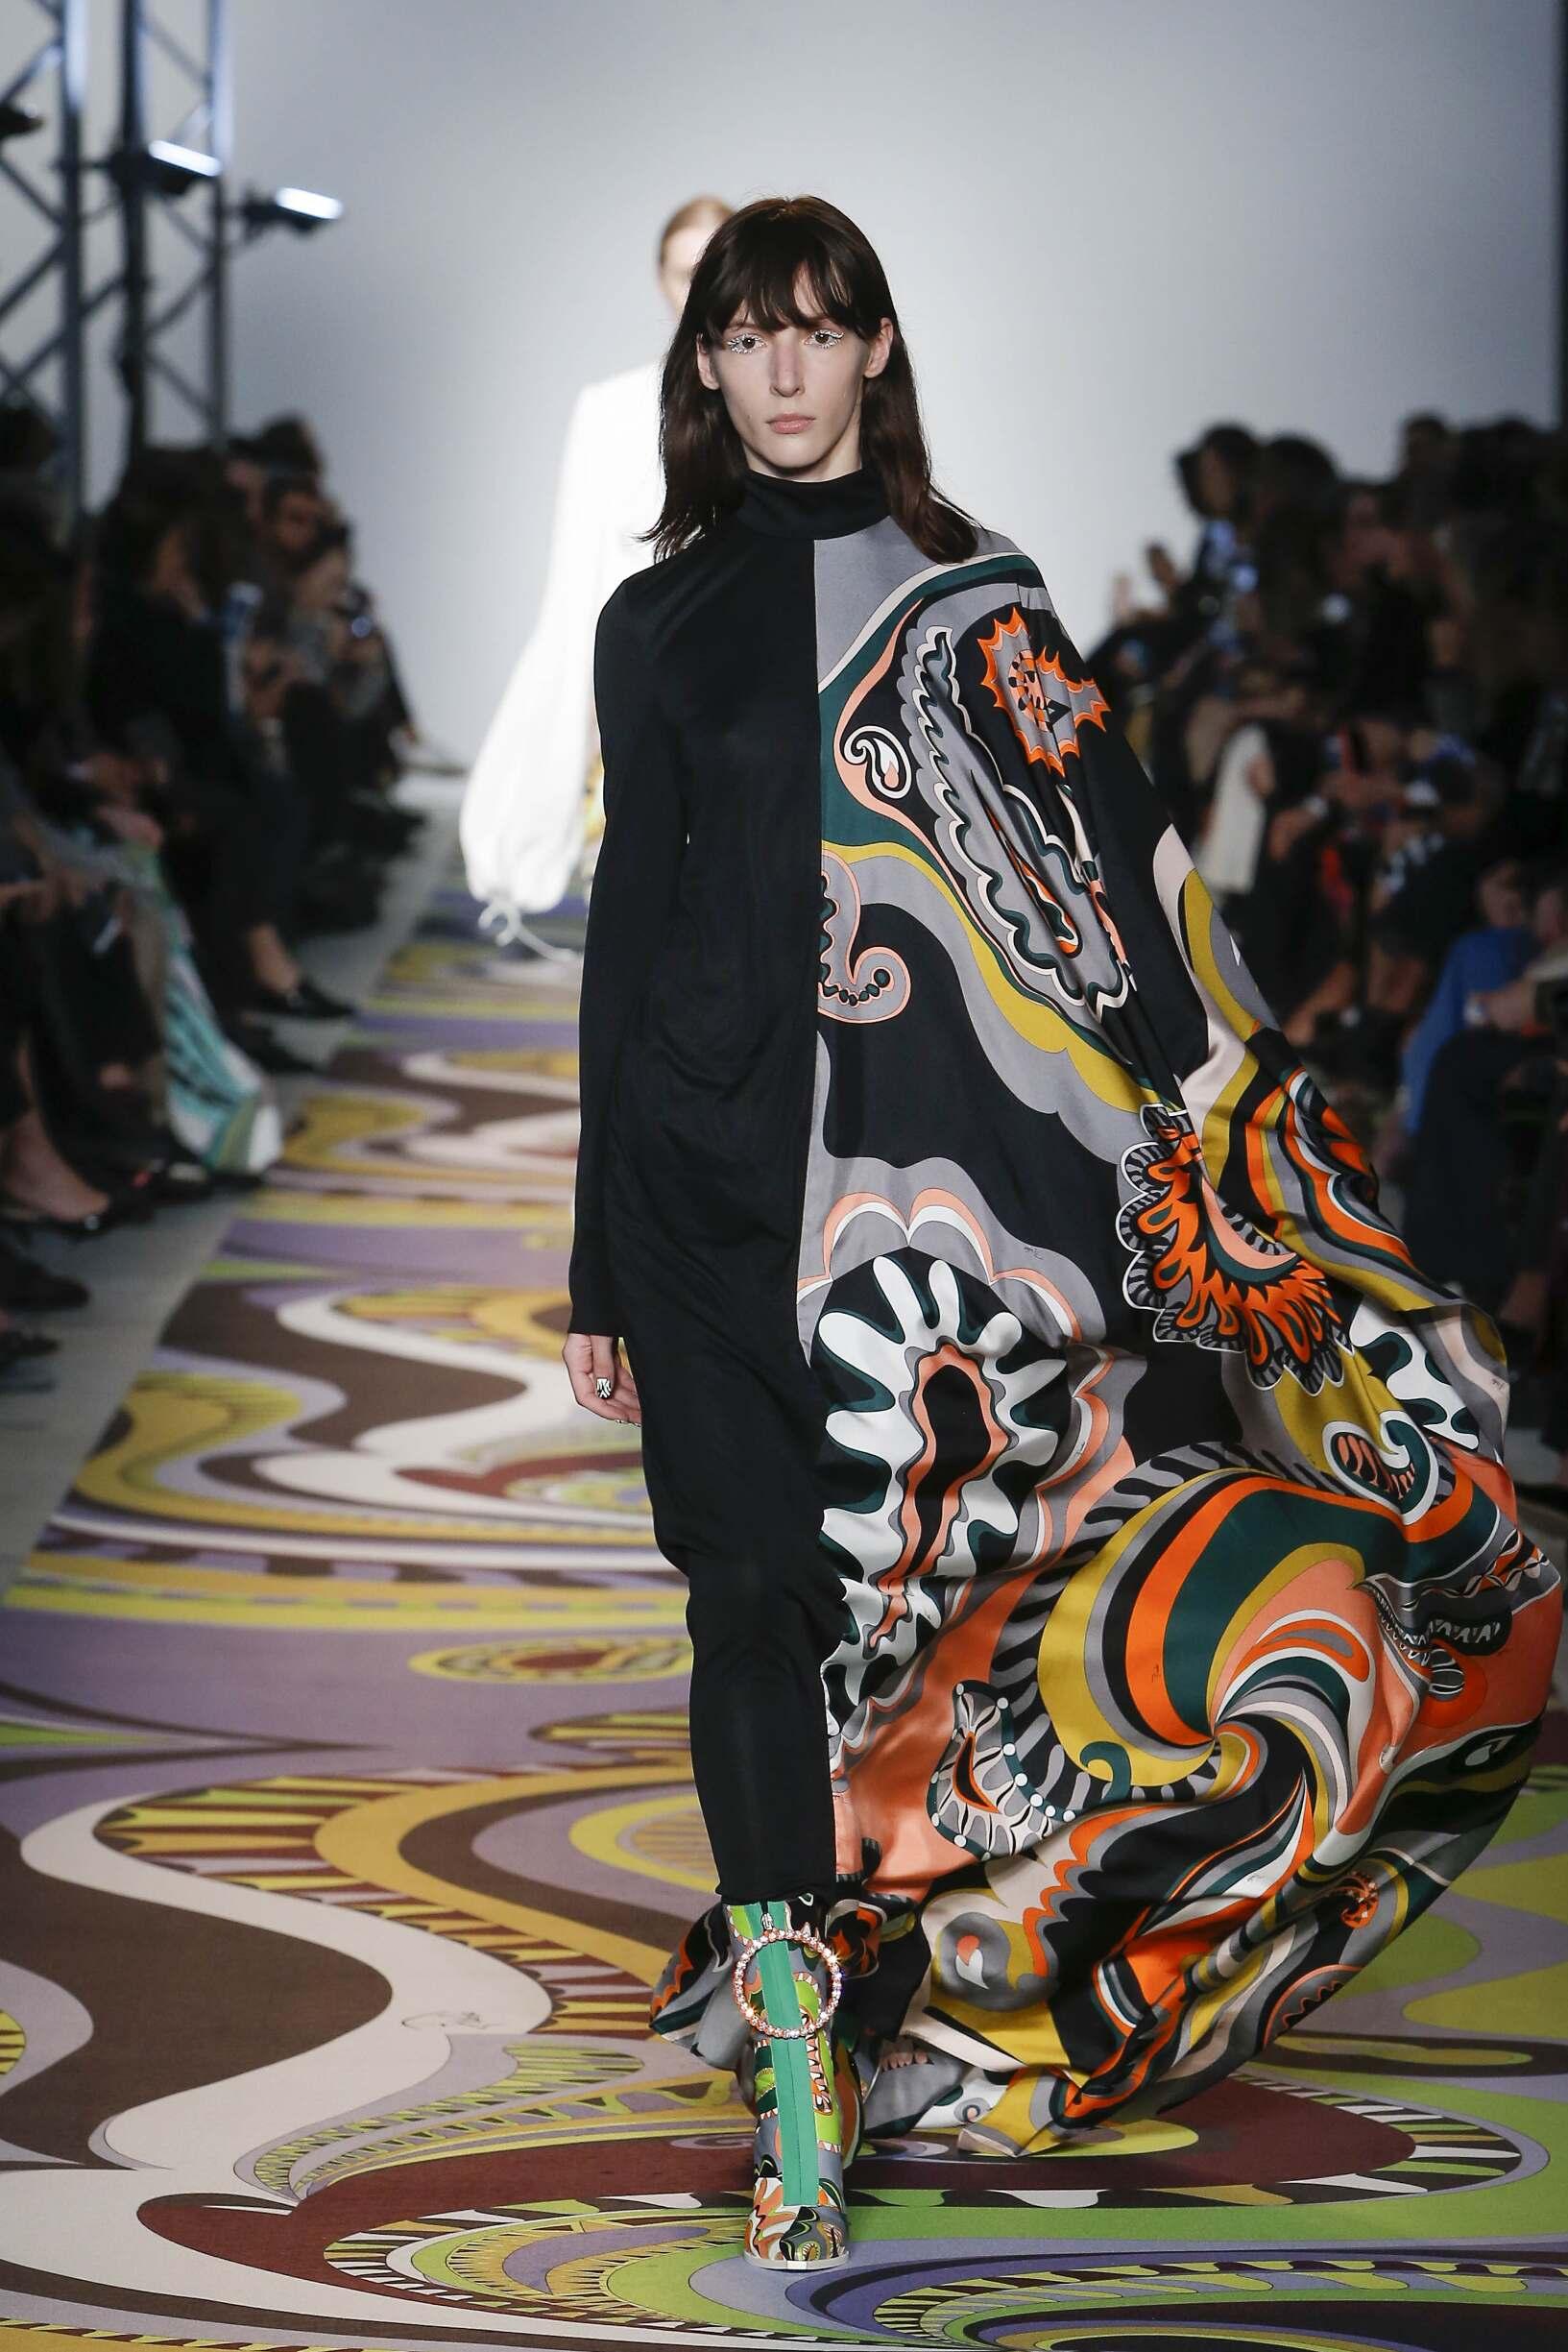 Fashion Woman Model Emilio Pucci Catwalk 17-18